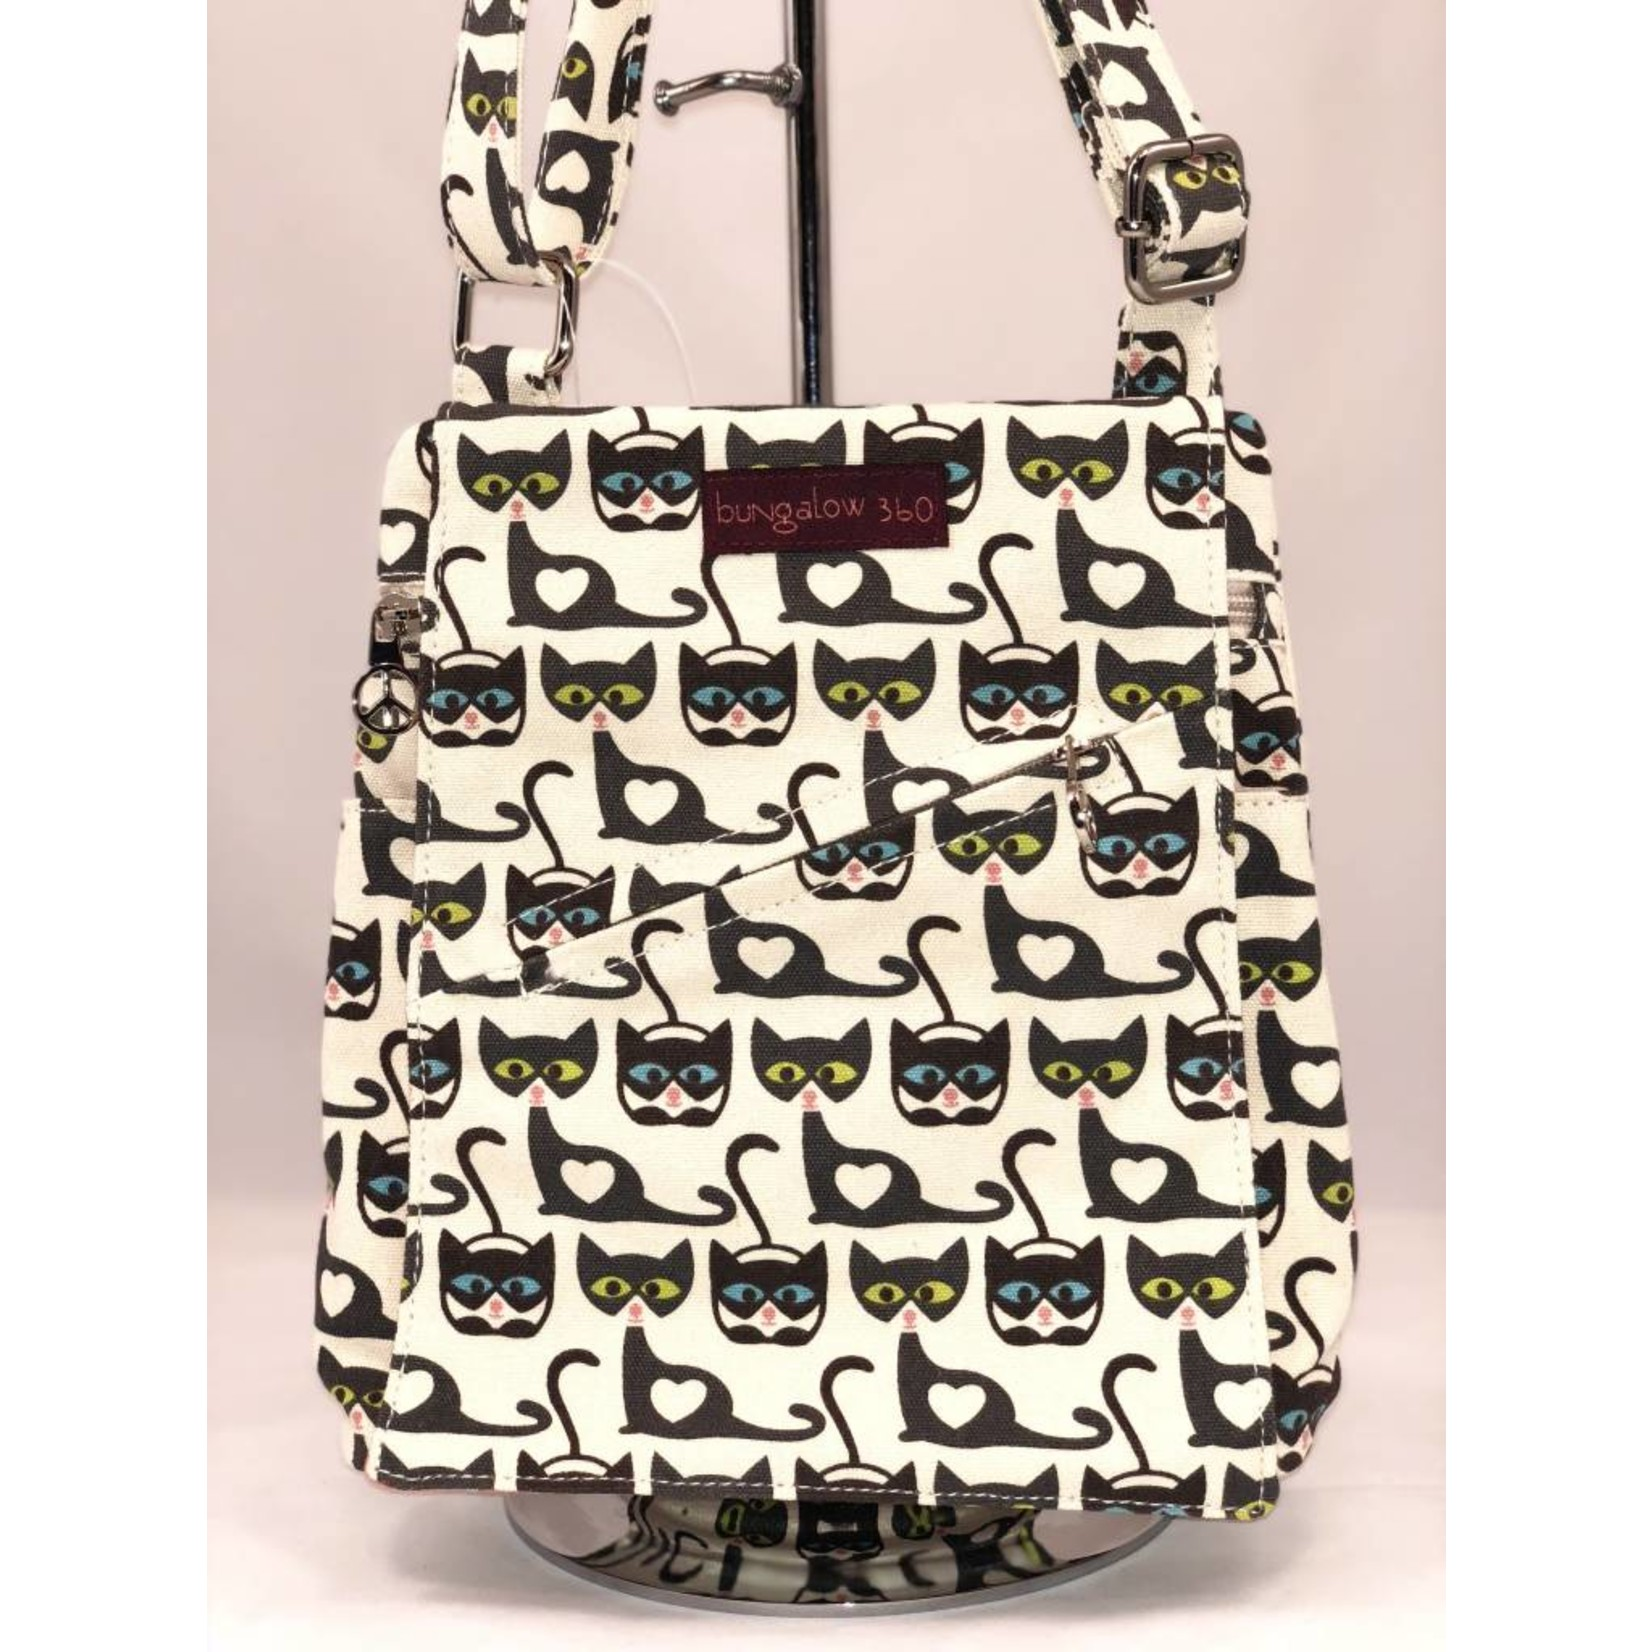 Bungalow 360 Small Messenger Bag - Cat